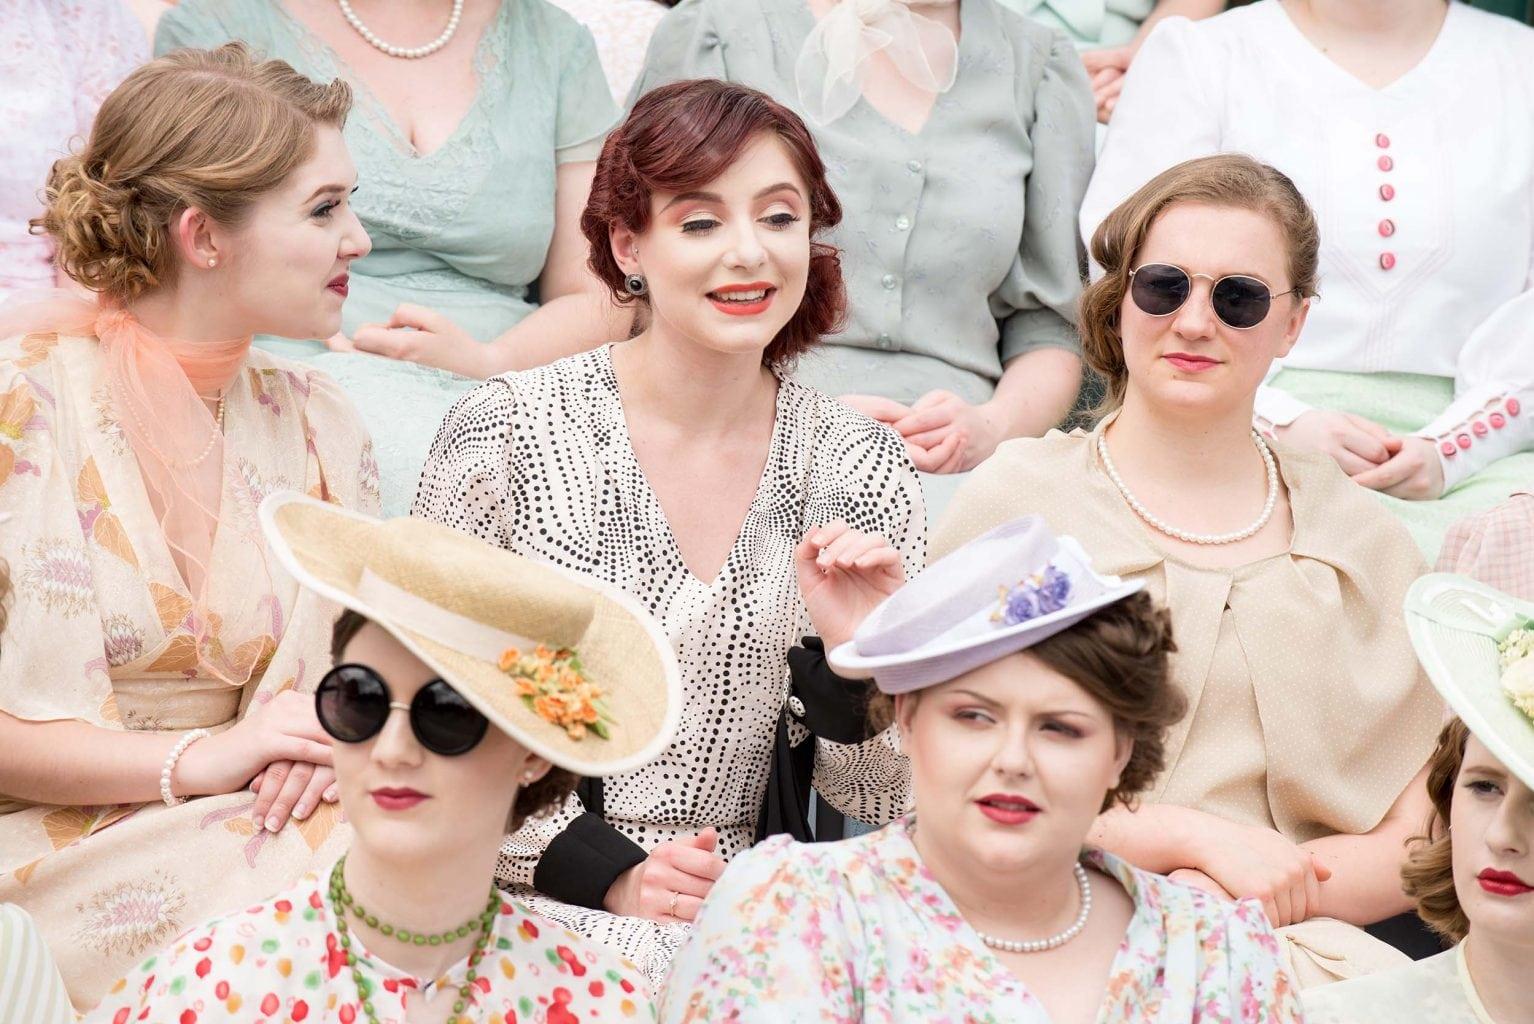 1930s Wimbledon costumes